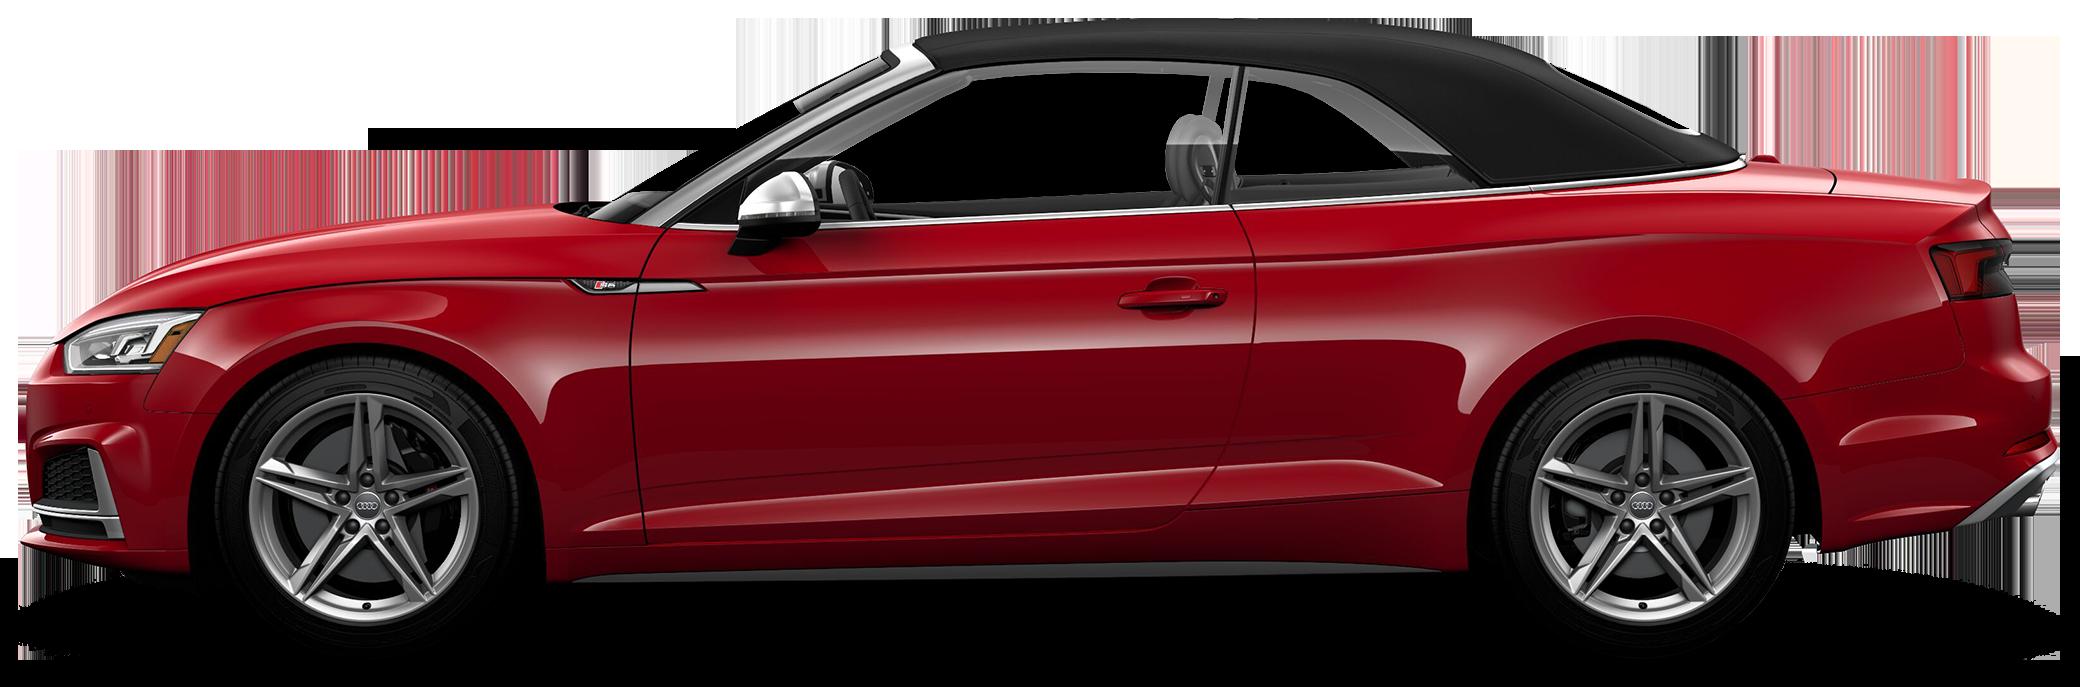 2019 Audi S5 Cabriolet 3.0T Prestige